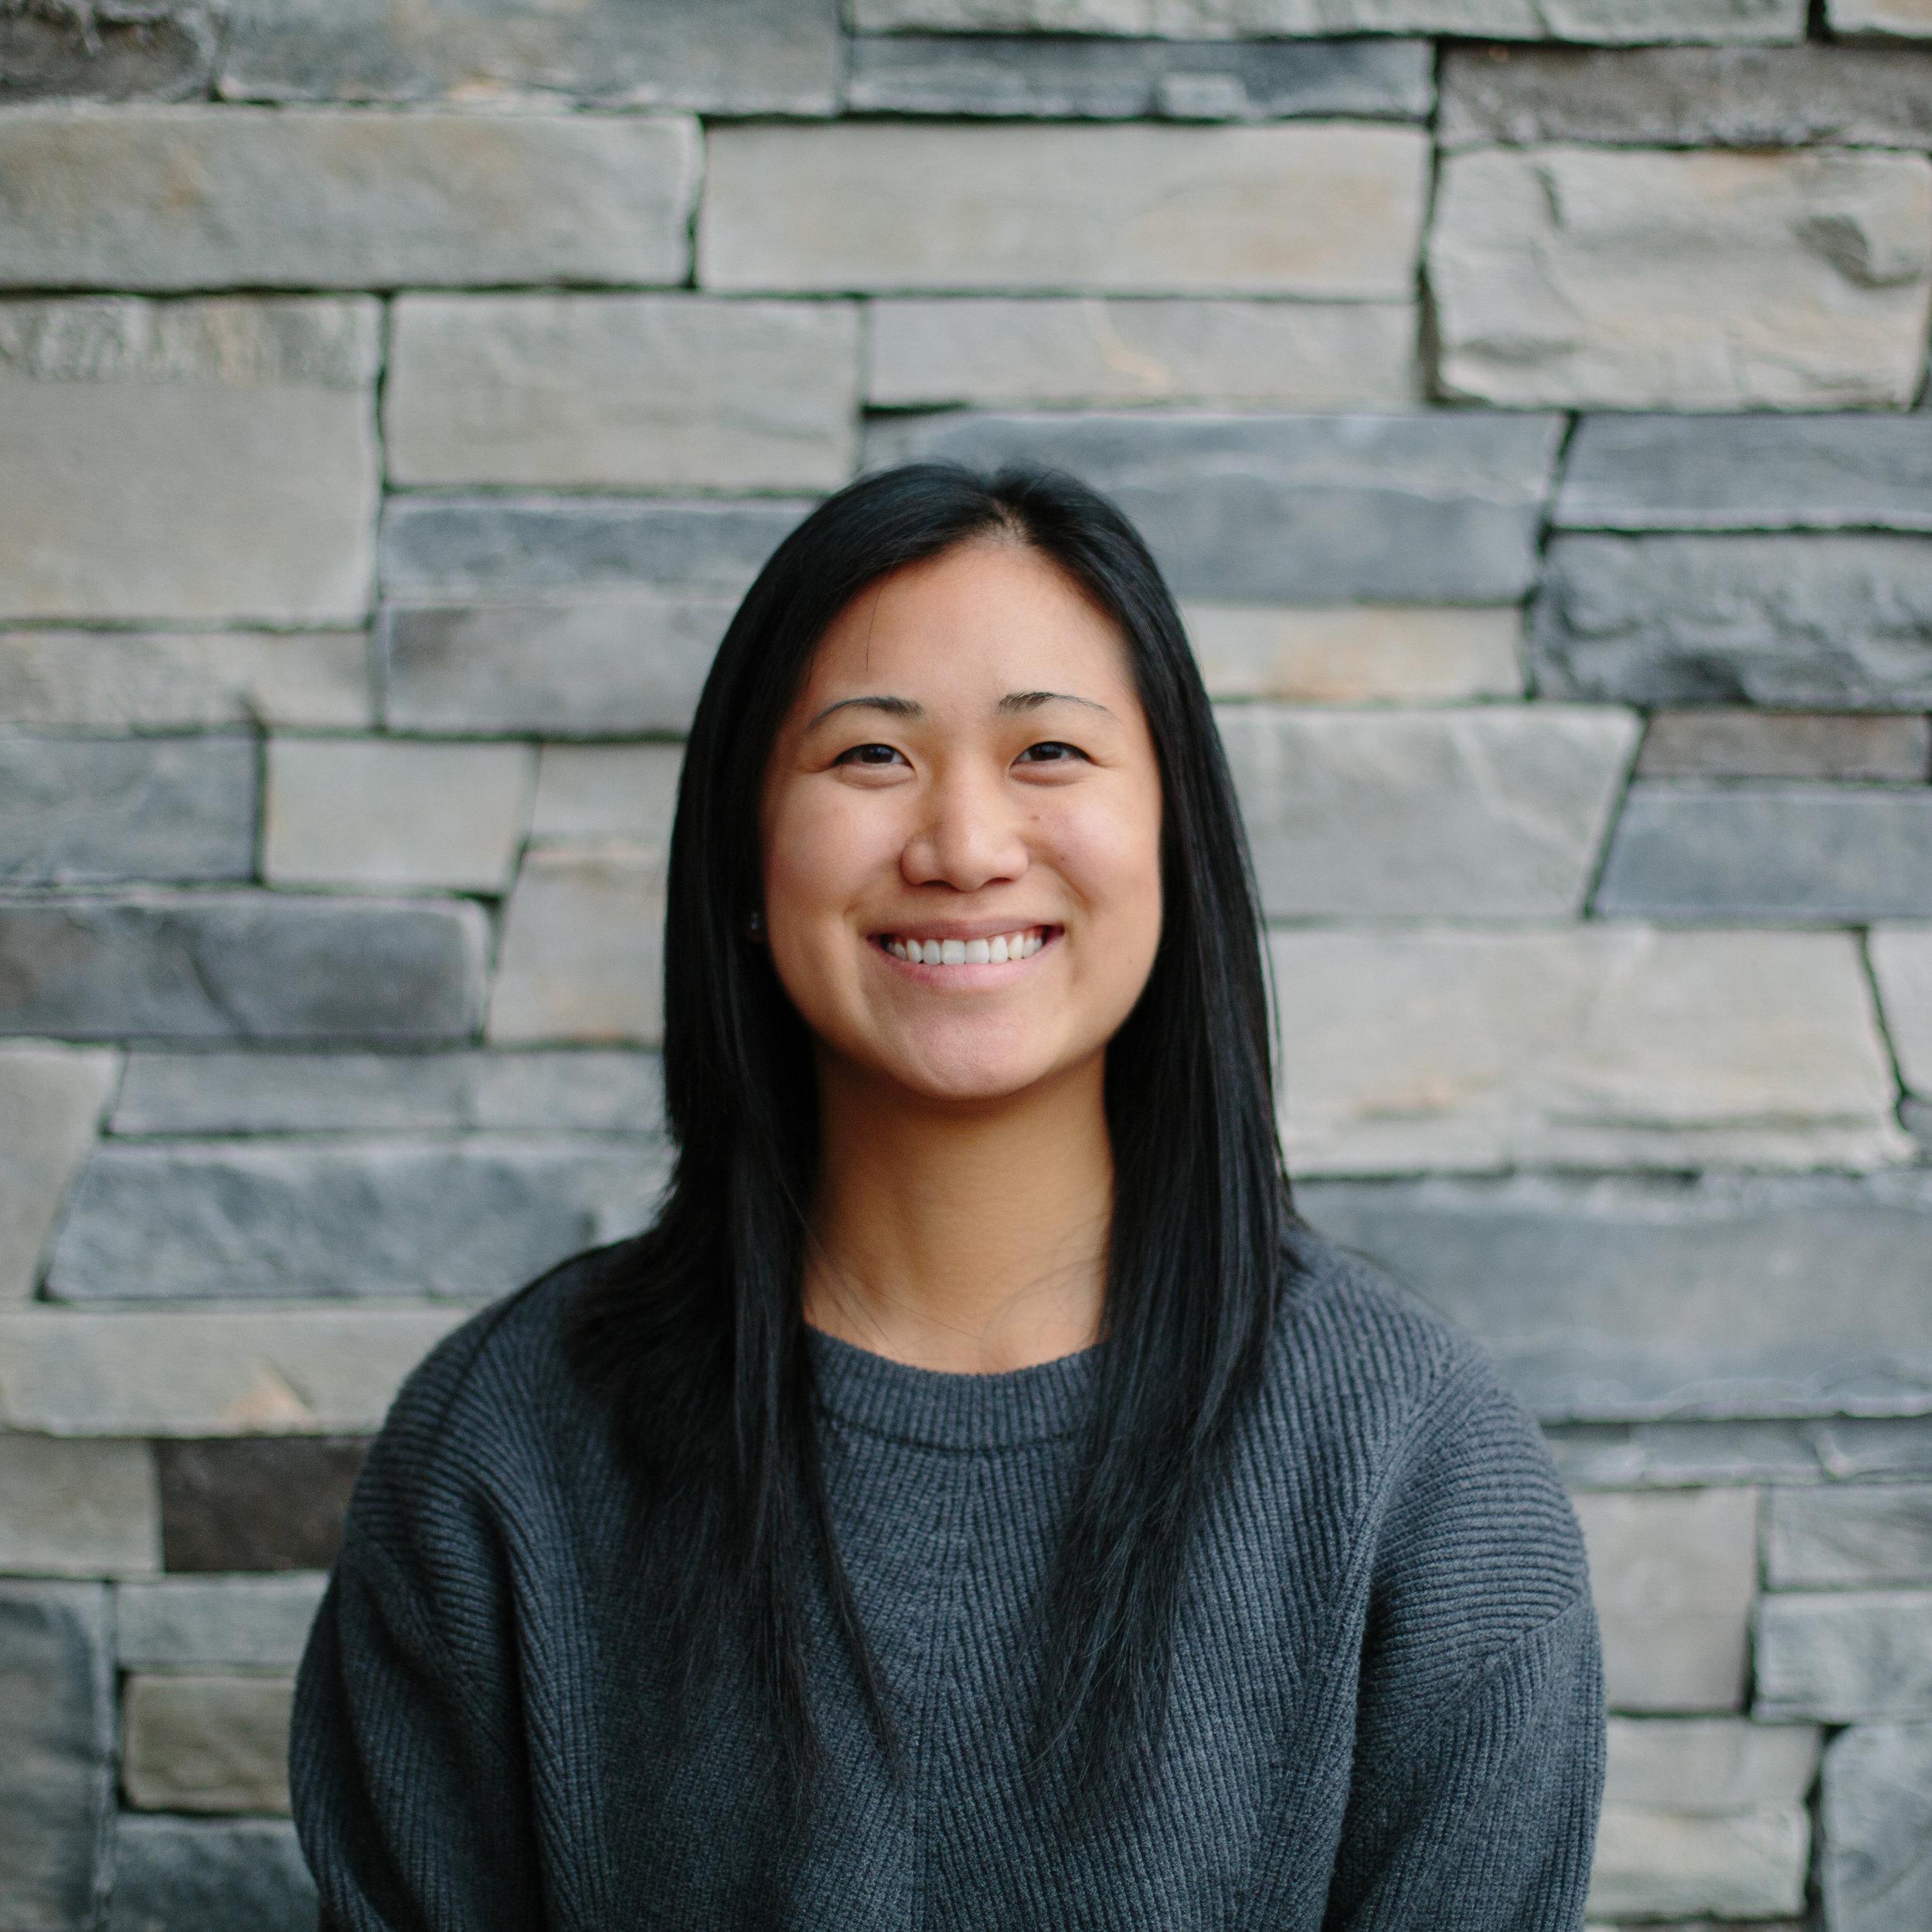 Valina Yen - Assistant to Pastor Brad